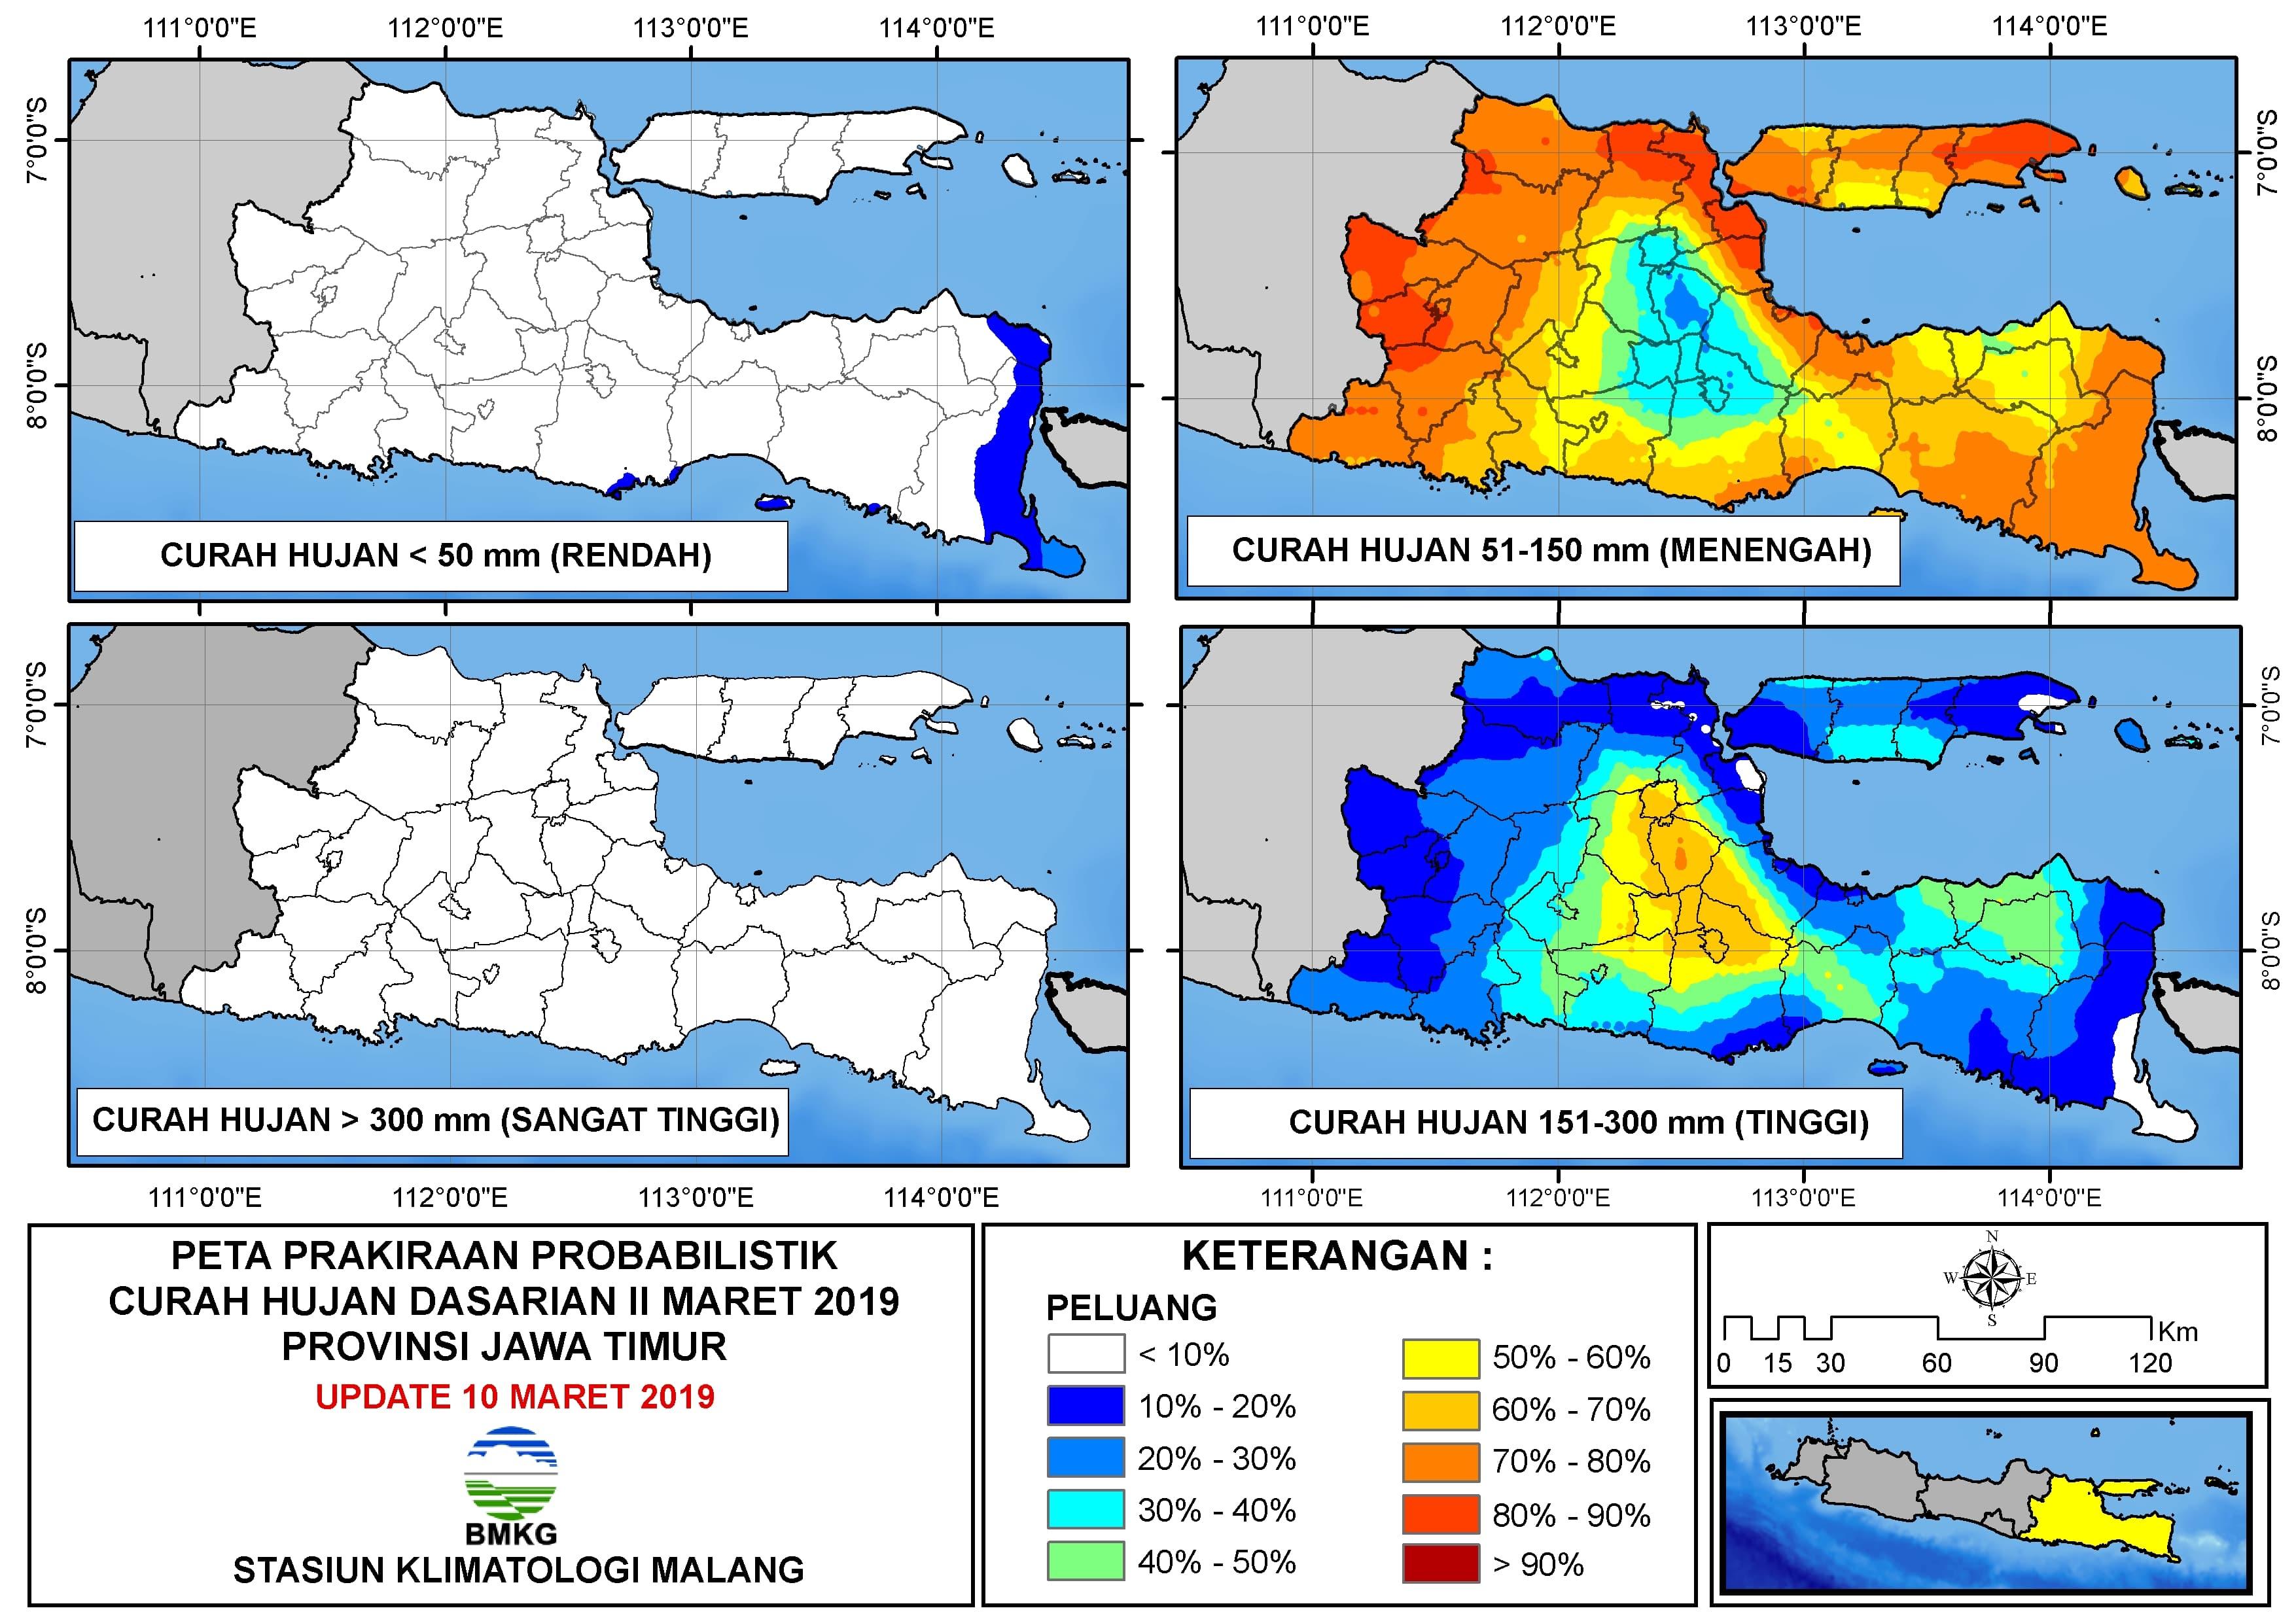 Peta Prakiraan Probabilistik Curah Hujan Dasarian II Provinsi Jawa Timur Update 10 Maret 2019